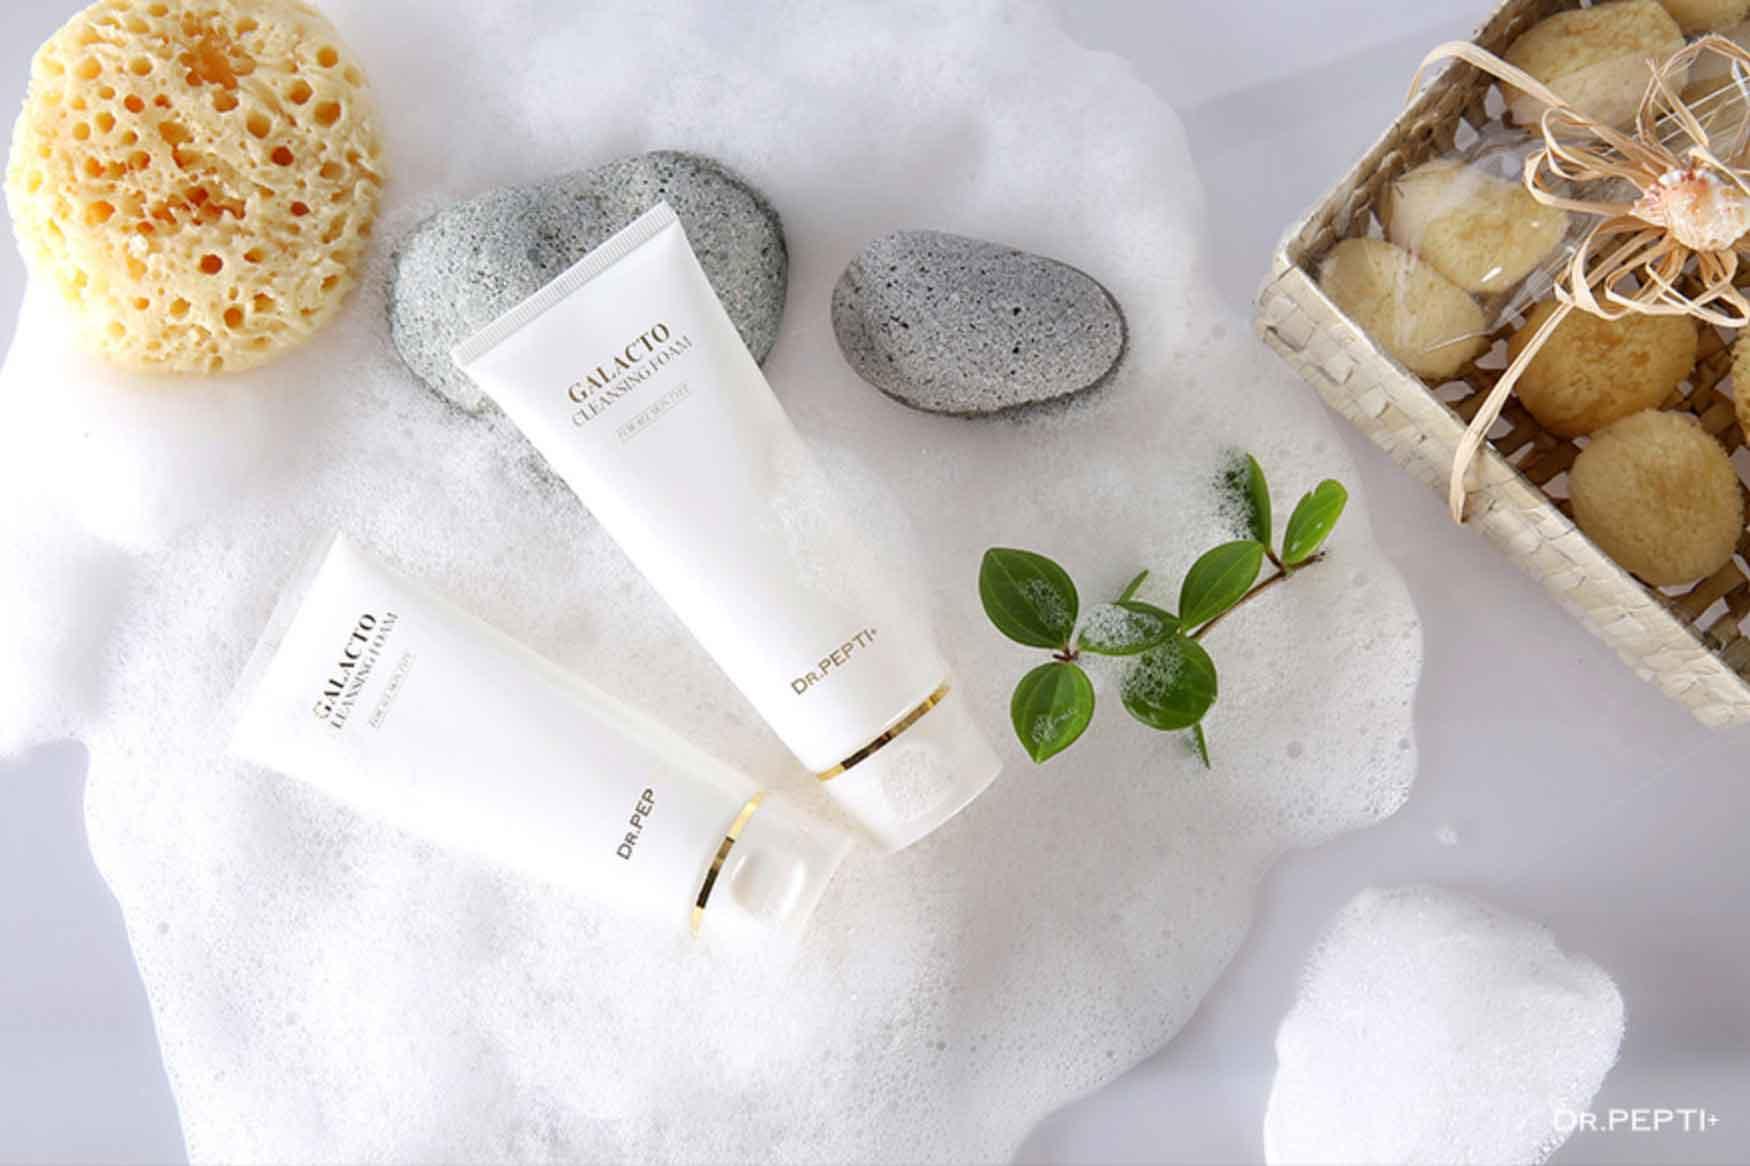 Sửa Rửa Mặt Tạo Bọt Dr Pepti+ Galacto Cleansing Foam - Ảnh 1